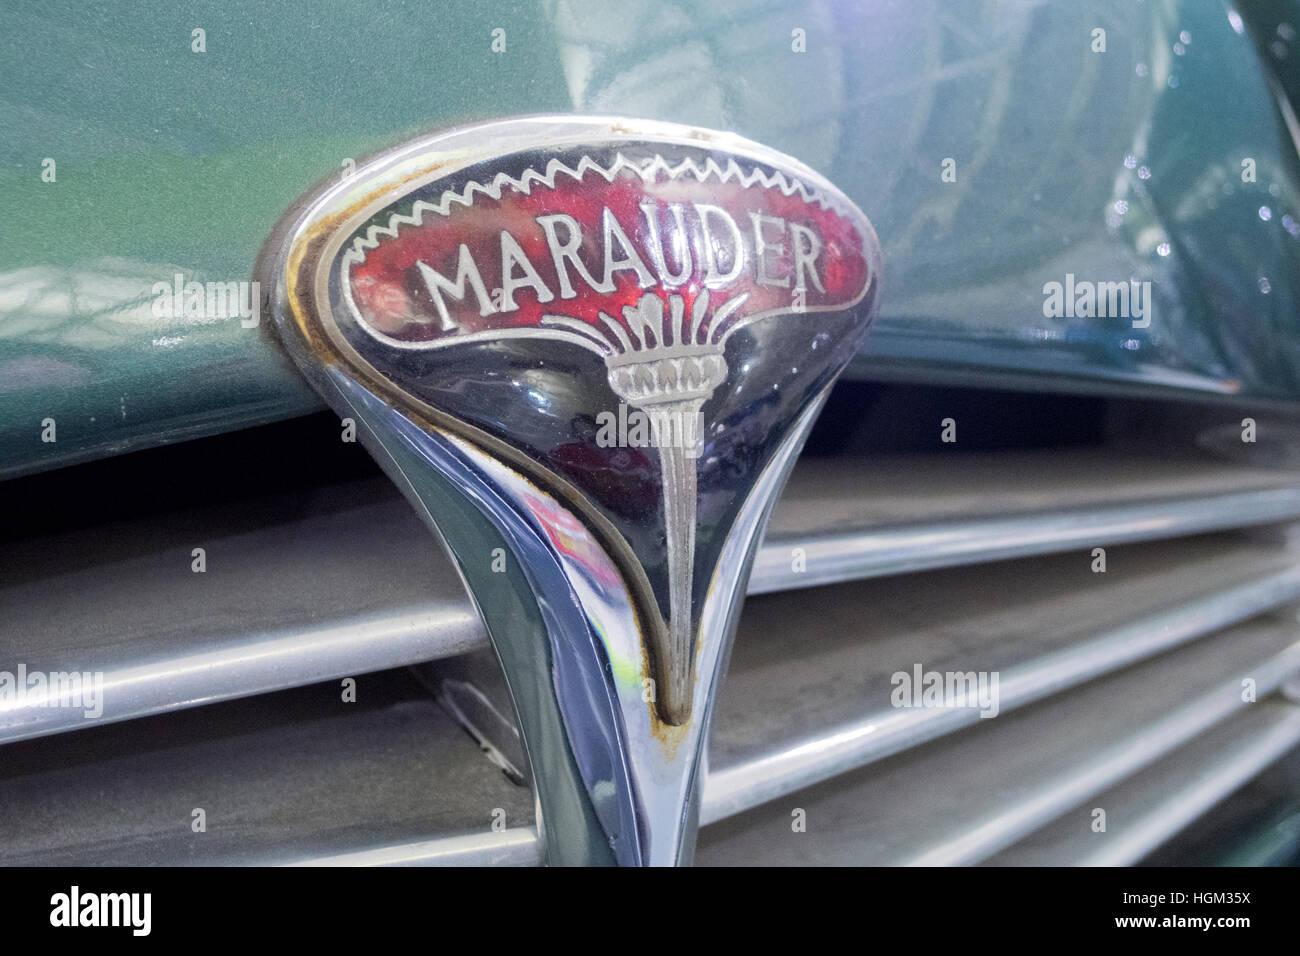 1951 Rover Marauder Car Name Badge, UK - Stock Image